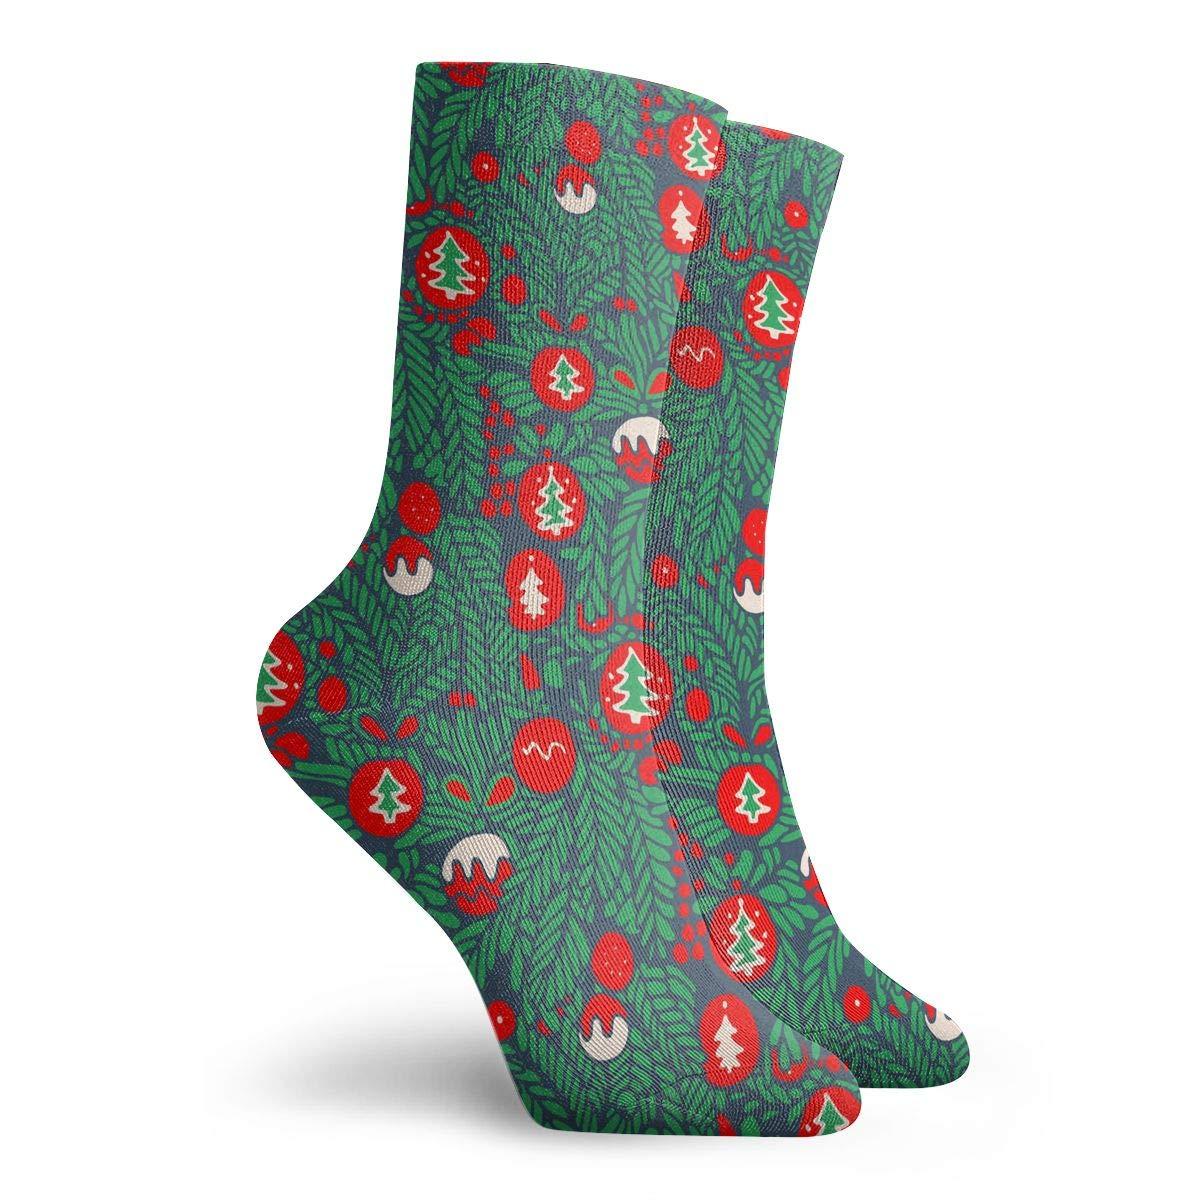 Animal Candy Elk Christmas Ball Fashion Dress Socks Short Socks Leisure Travel 11.8 Inch